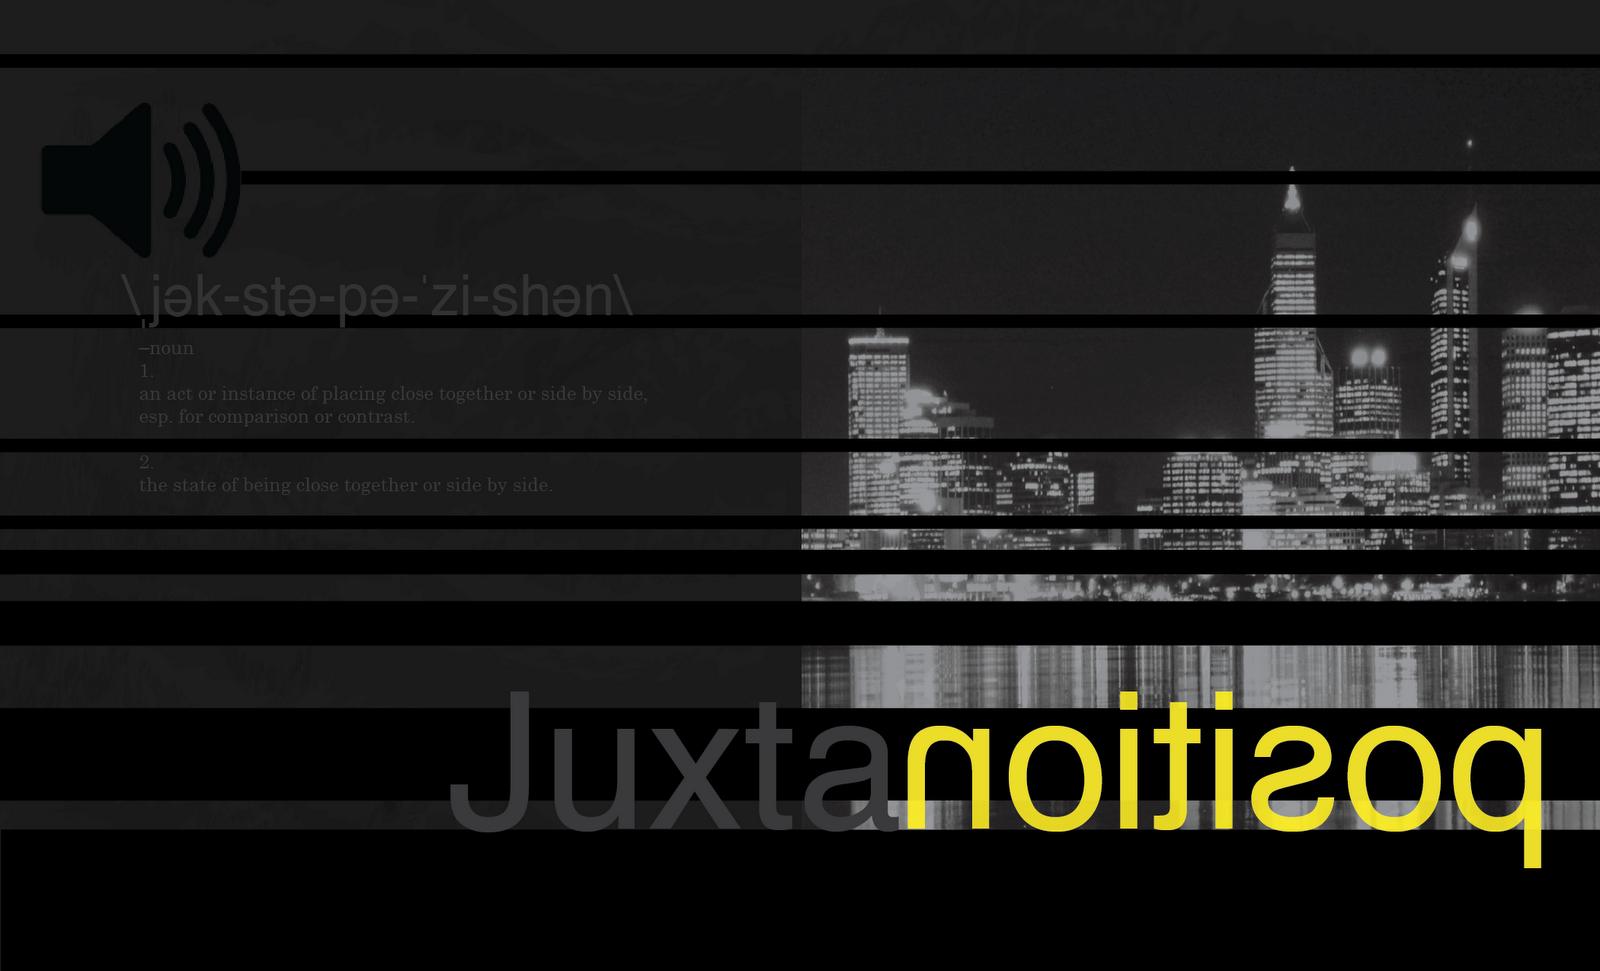 Zpirnot Typography Definition Juxtaposition